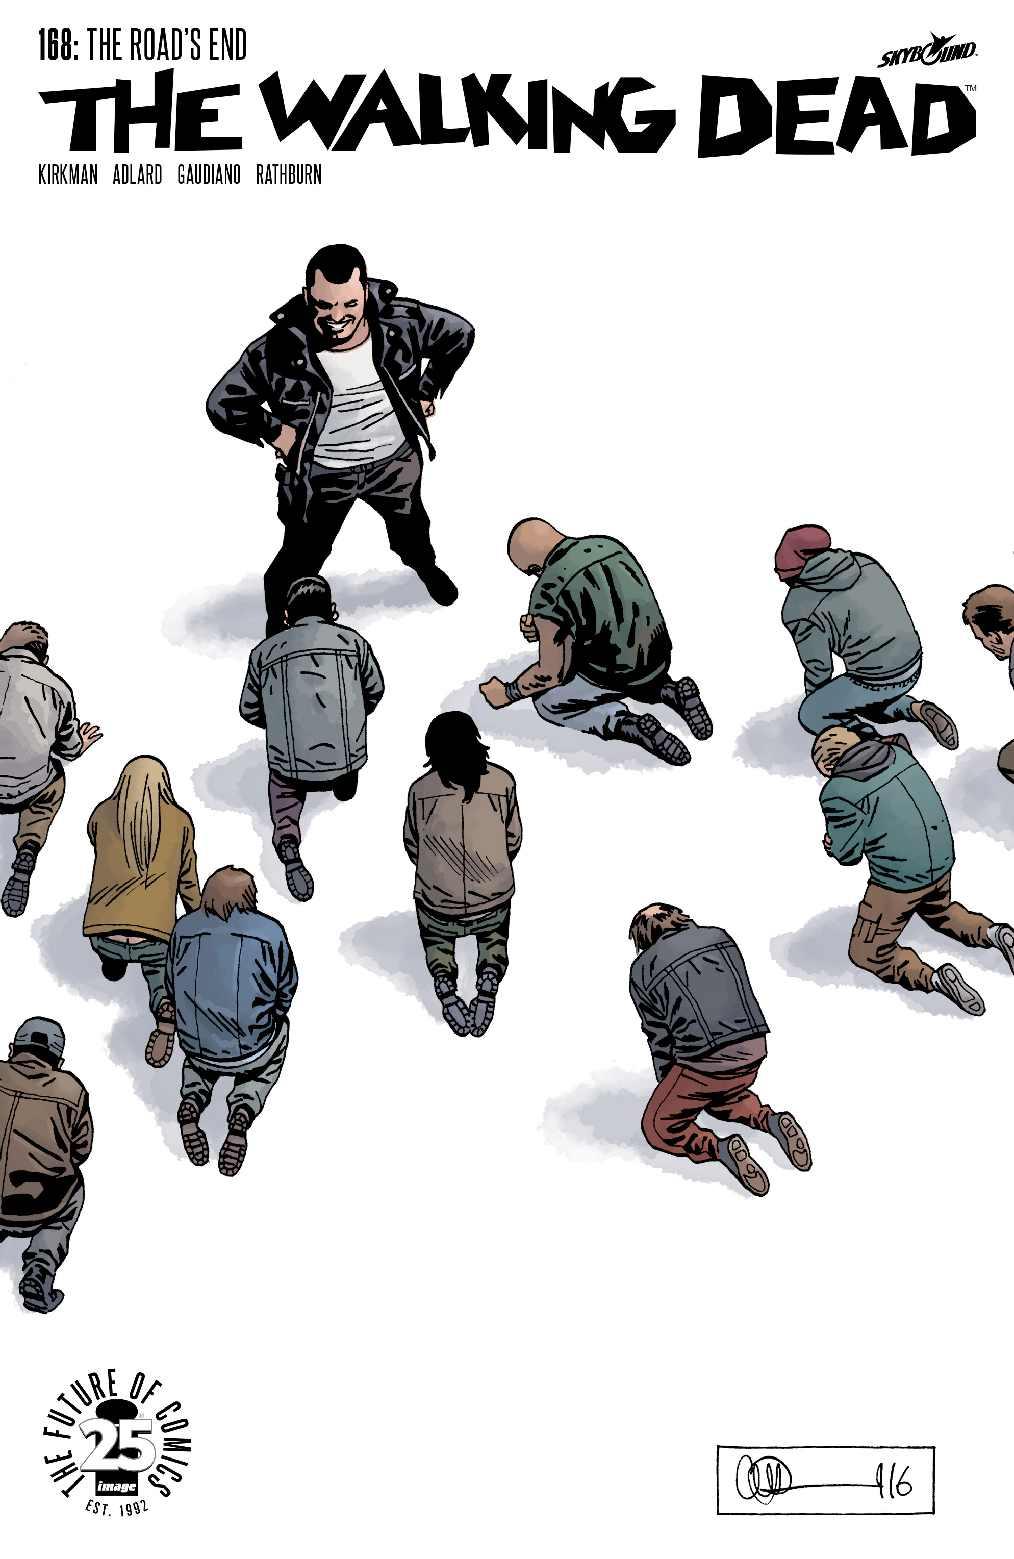 Read Comics Online Free - The Walking Dead - Chapter 168